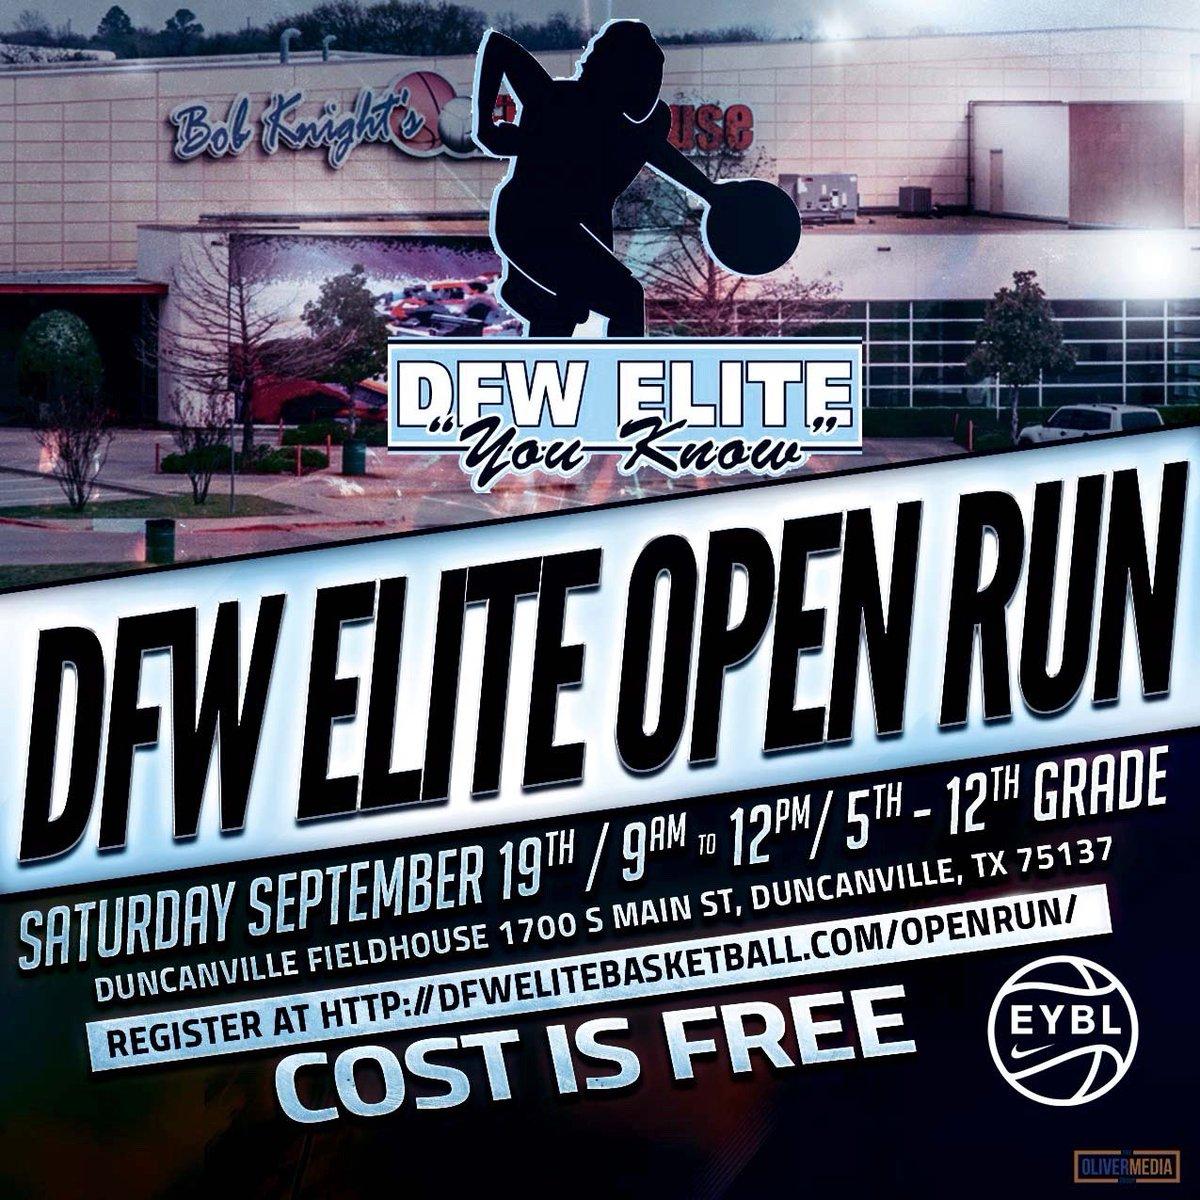 Girls let's Hoop!   DFW Elite Open Run 5th-12th Grades  Sat 9a-12p Duncanville Fieldhouse  Cost is FREE!!!! https://t.co/dU0kPjN0Qd